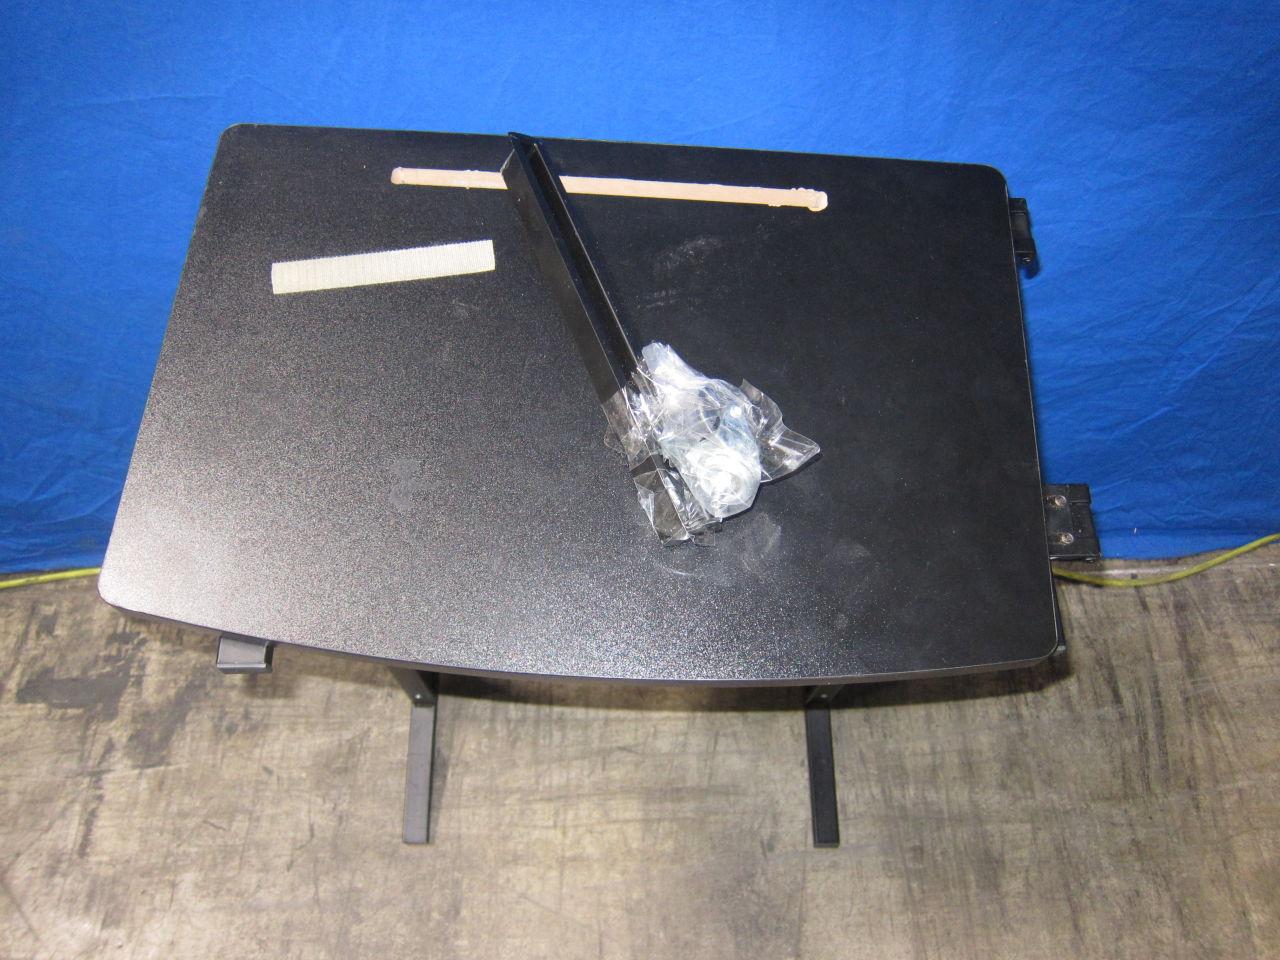 XINYAO METAL WORK NANHAI FOSHAN Rolling Desk